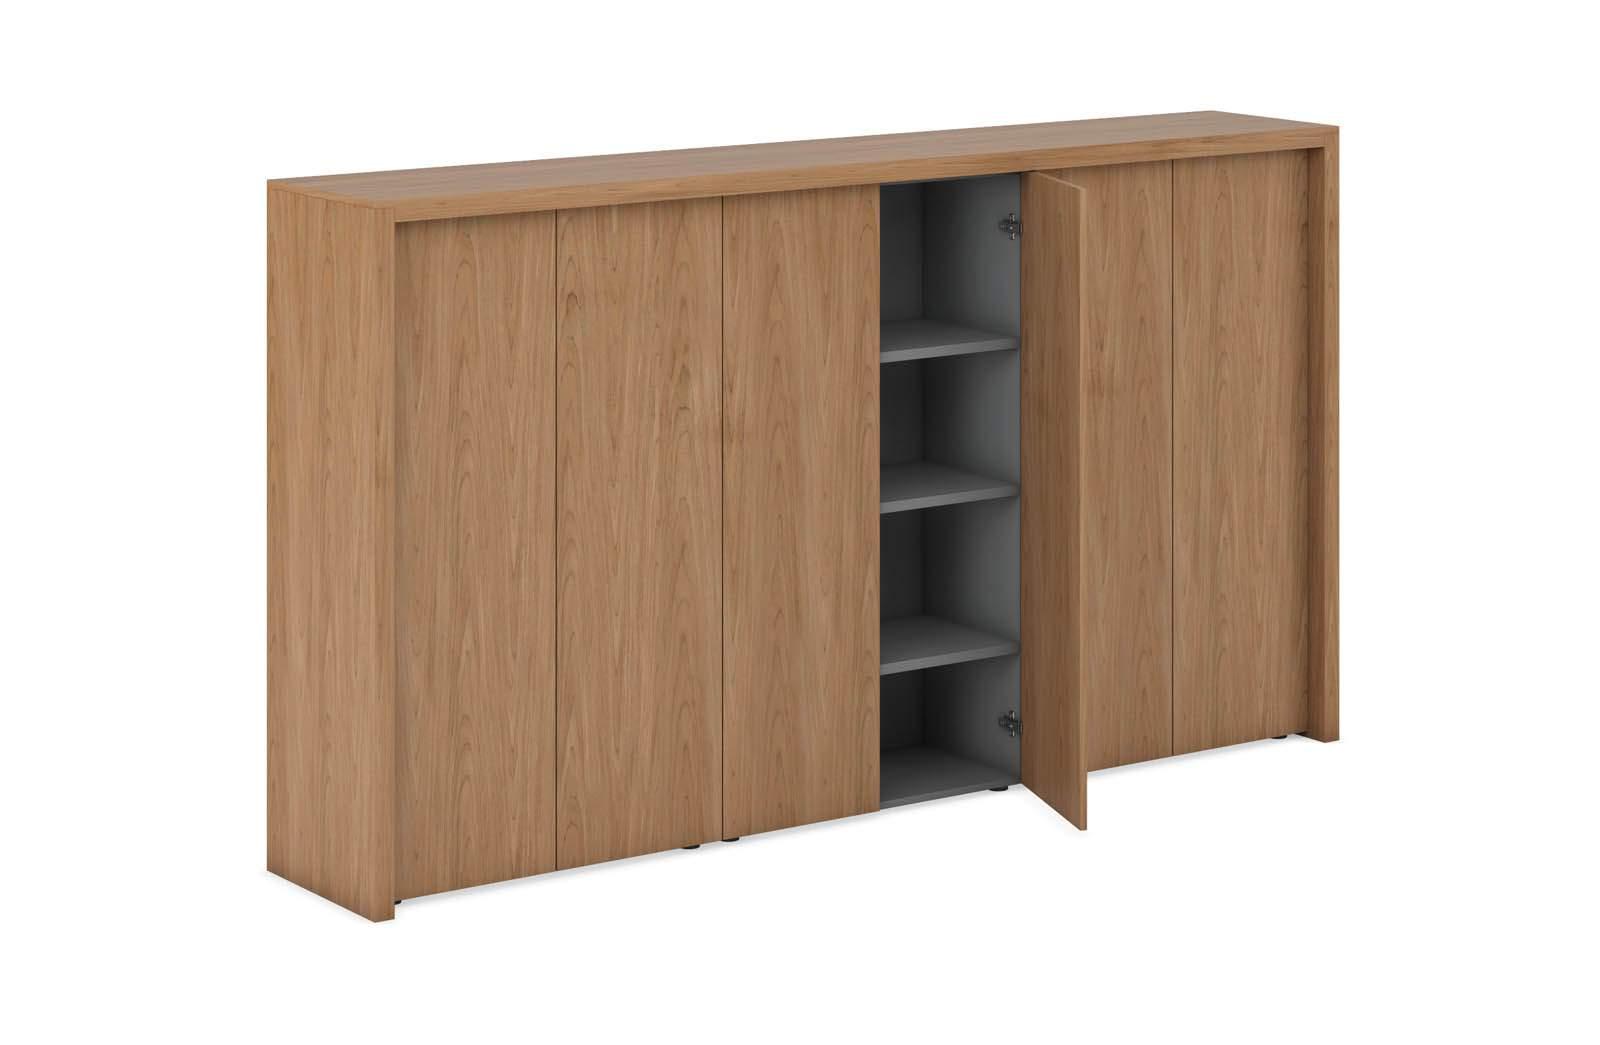 Композиция из 3 шкафов средних с декоративной обвязкой 2800x500x1567